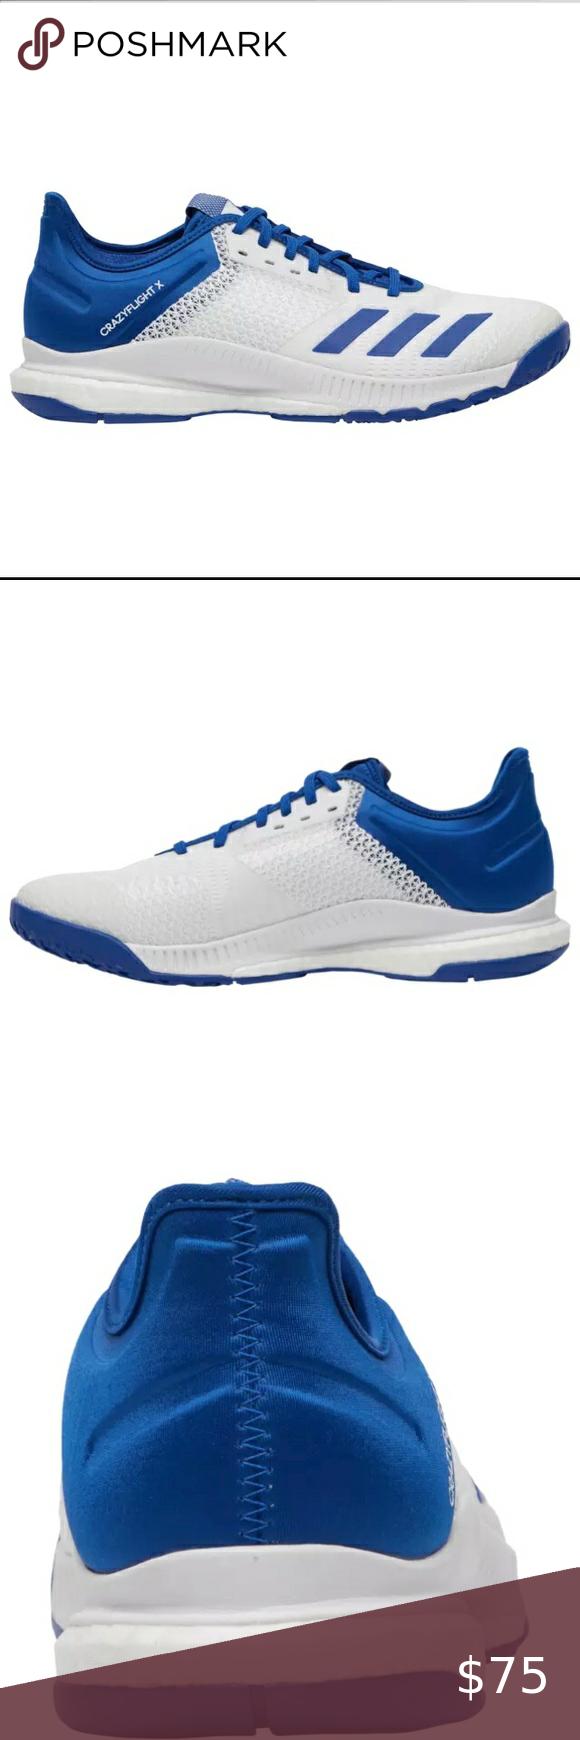 Nwt Adidas Crazyflight X 3 Volleyball Shoe Women S Nwt Adidas Crazyflight X 3 Volleyball Shoe Women S Blue White Size In 2020 Volleyball Shoes Women Shoes Adidas Shoes